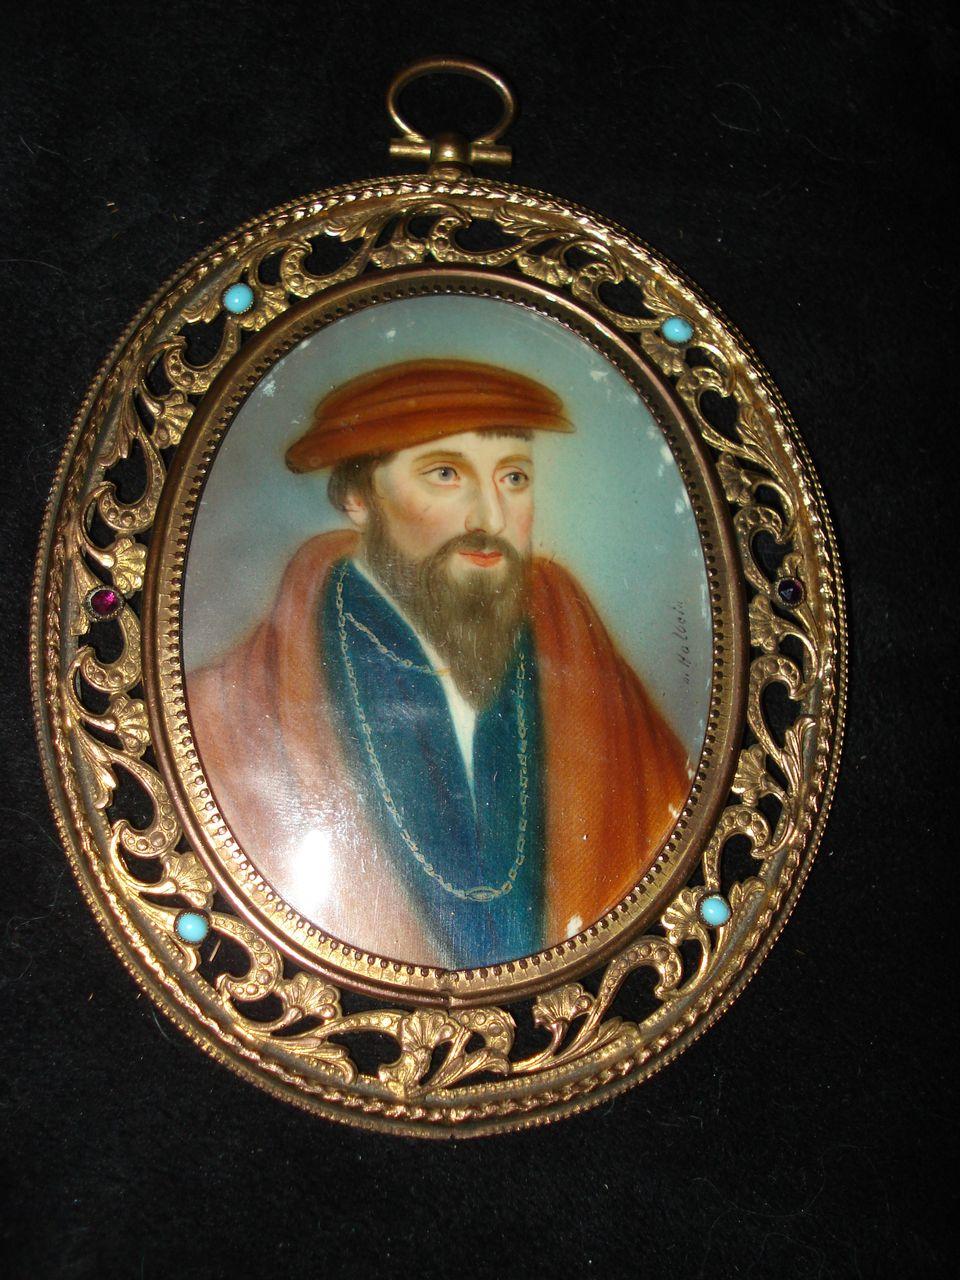 Miniature Portrait King James Of Scotland